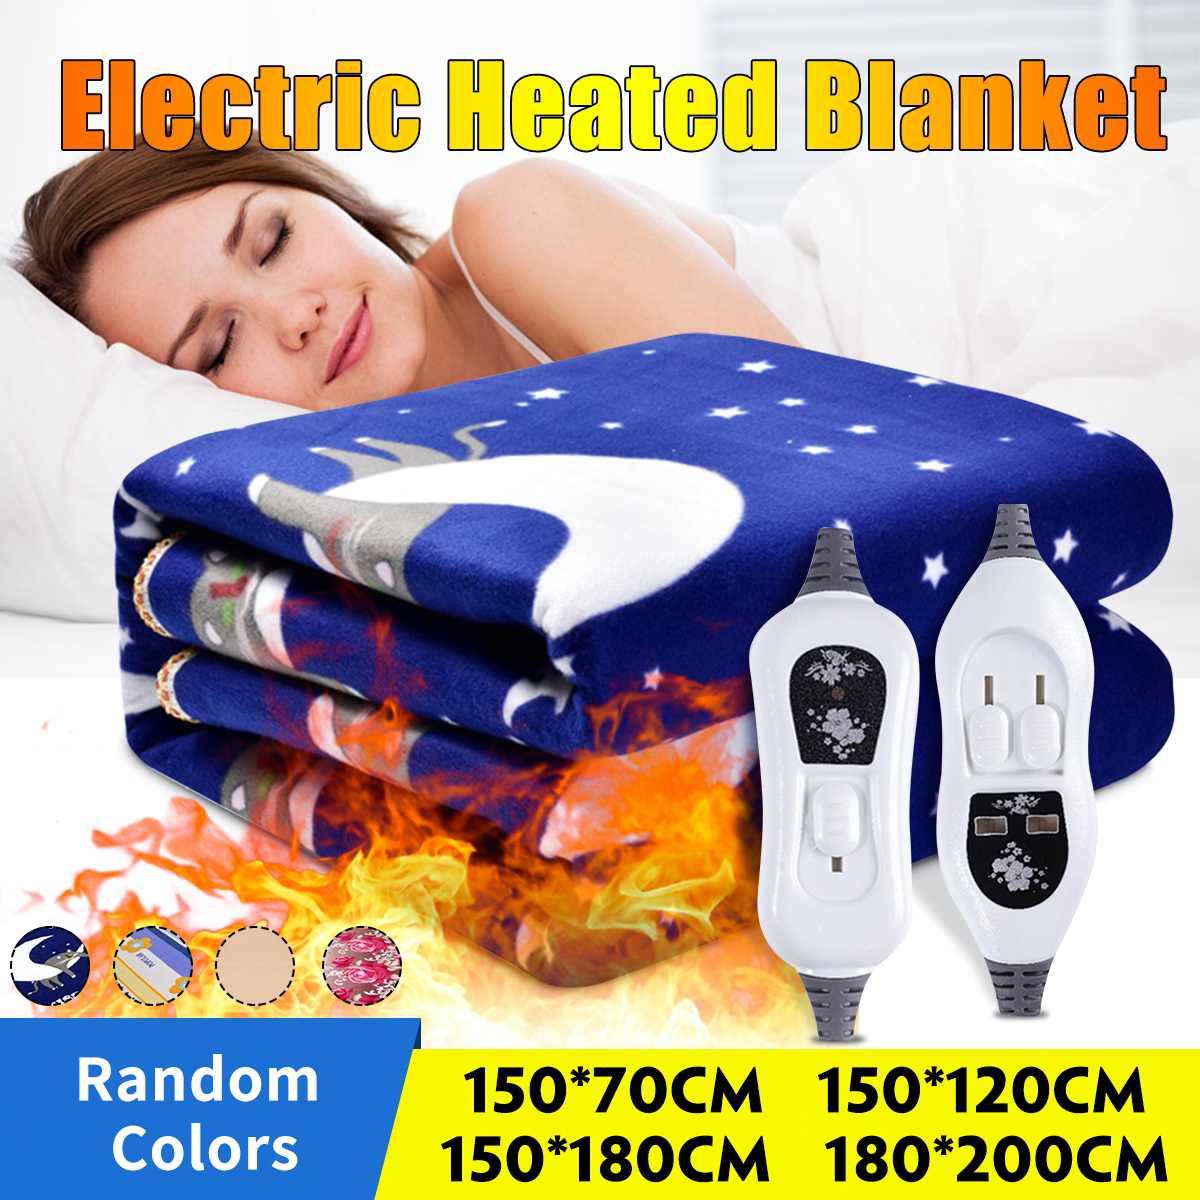 Manta eléctrica calentador caliente para cuerpo Manta eléctrica 220V Manta caliente almohadilla...